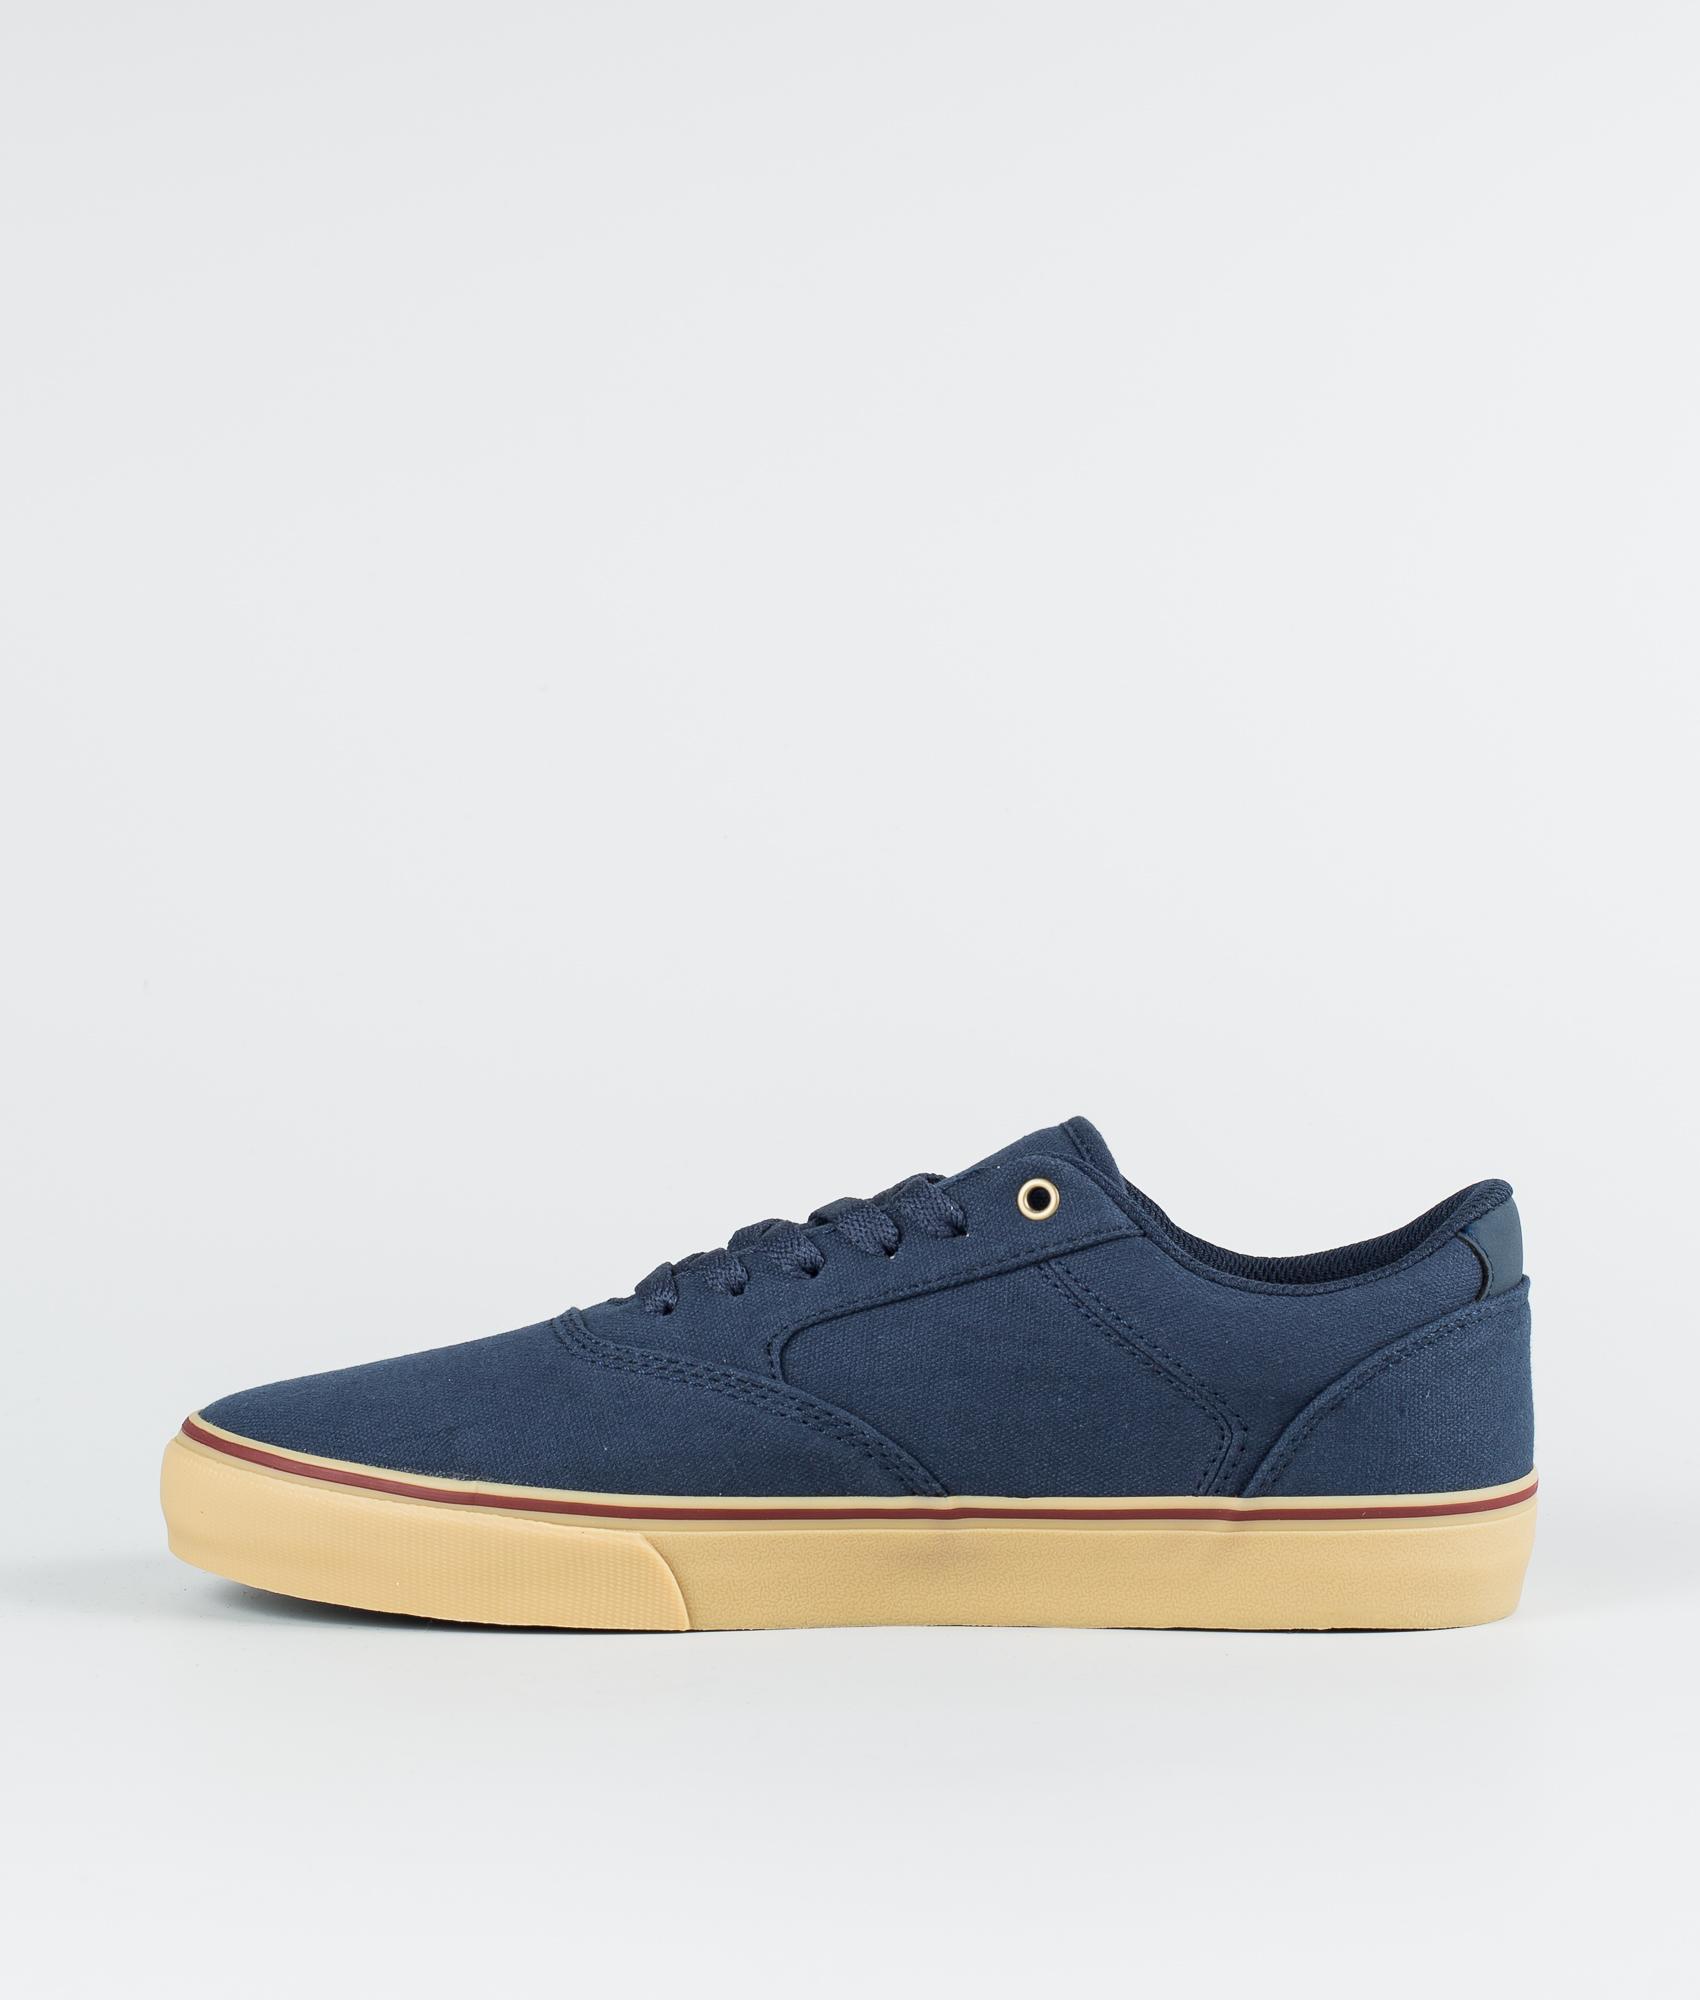 Etnies Blitz Zapatos NavyGum